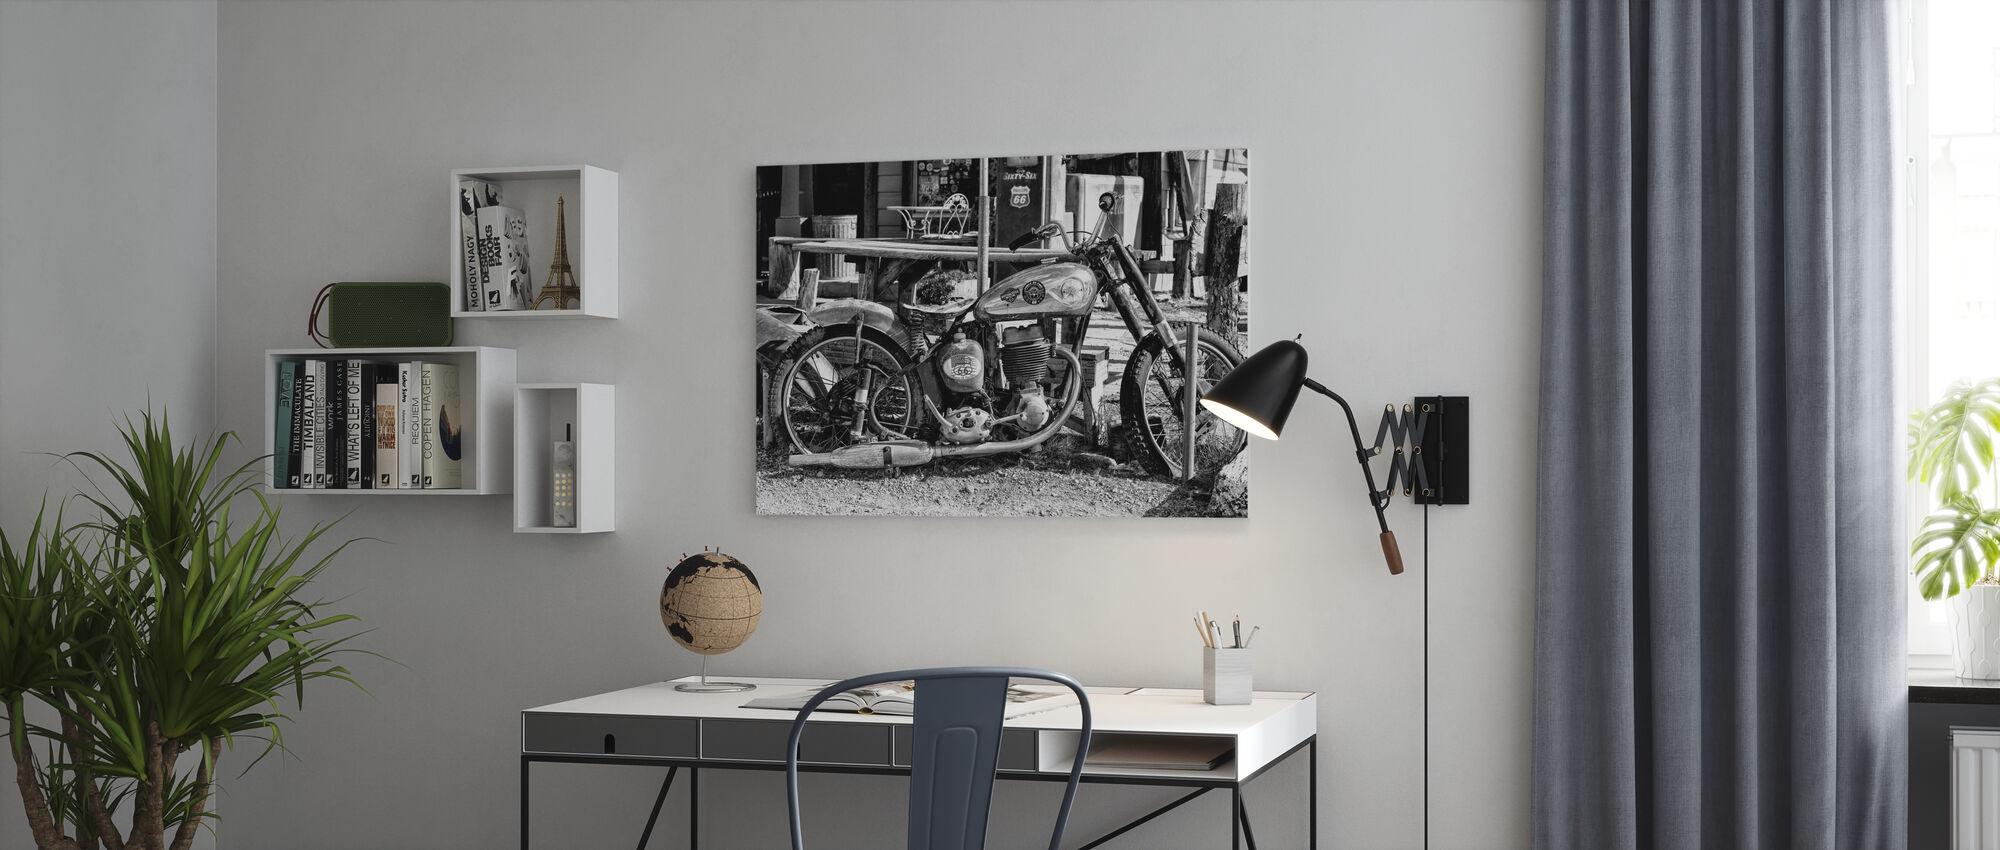 Black Arizona - Motorcycle Route US 66 - Canvas print - Office